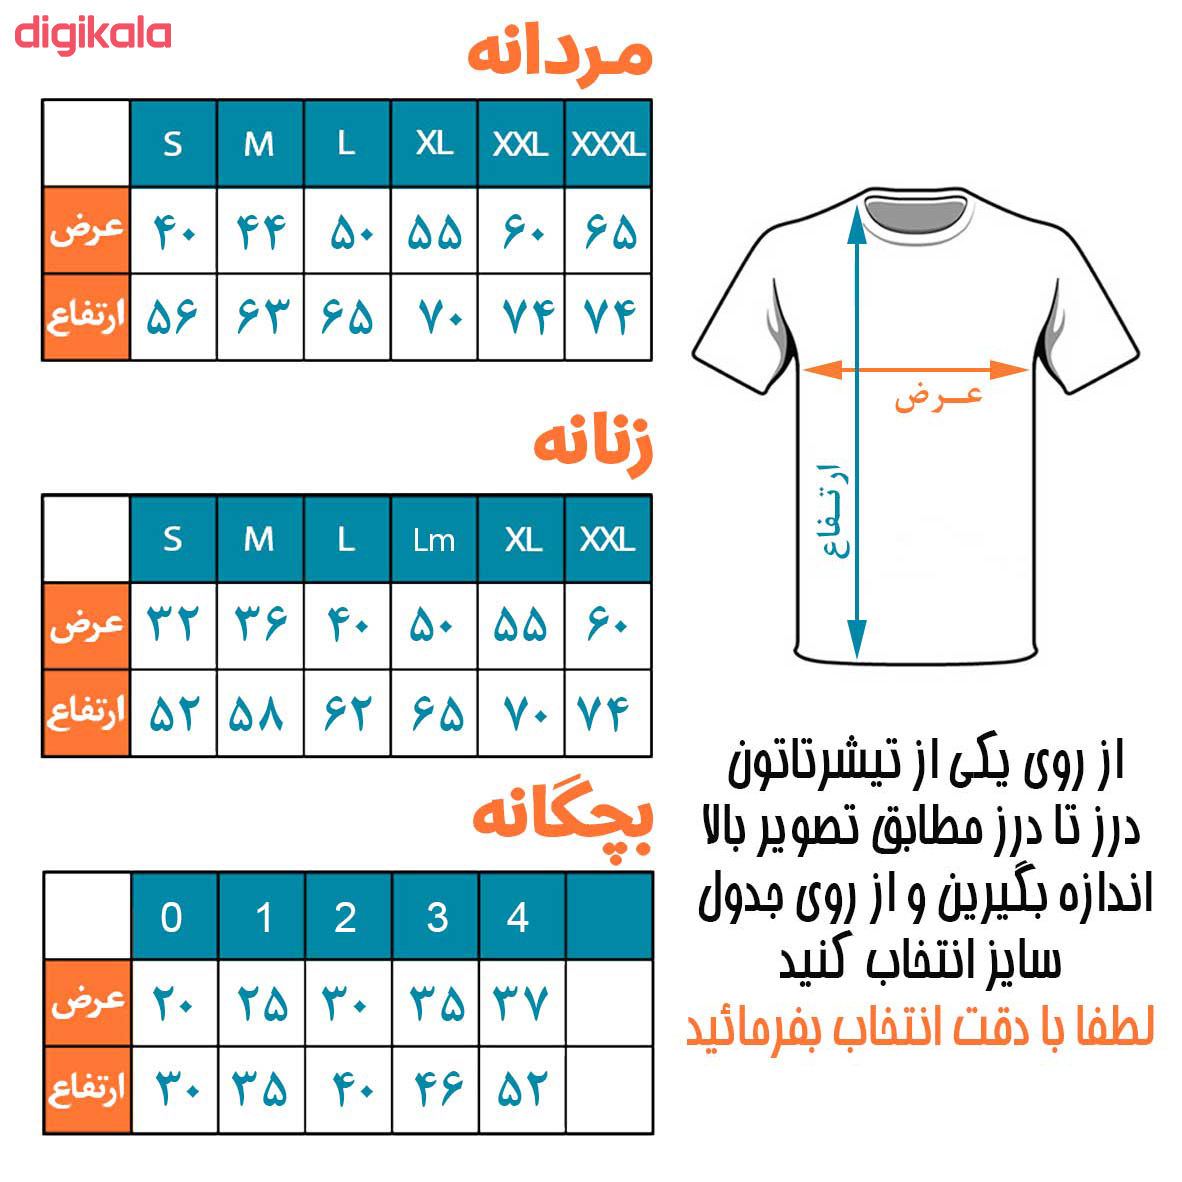 تیشرت آستین کوتاه  بچگانه  طرح هیچ مولانا   کد      کد KT017 main 1 2